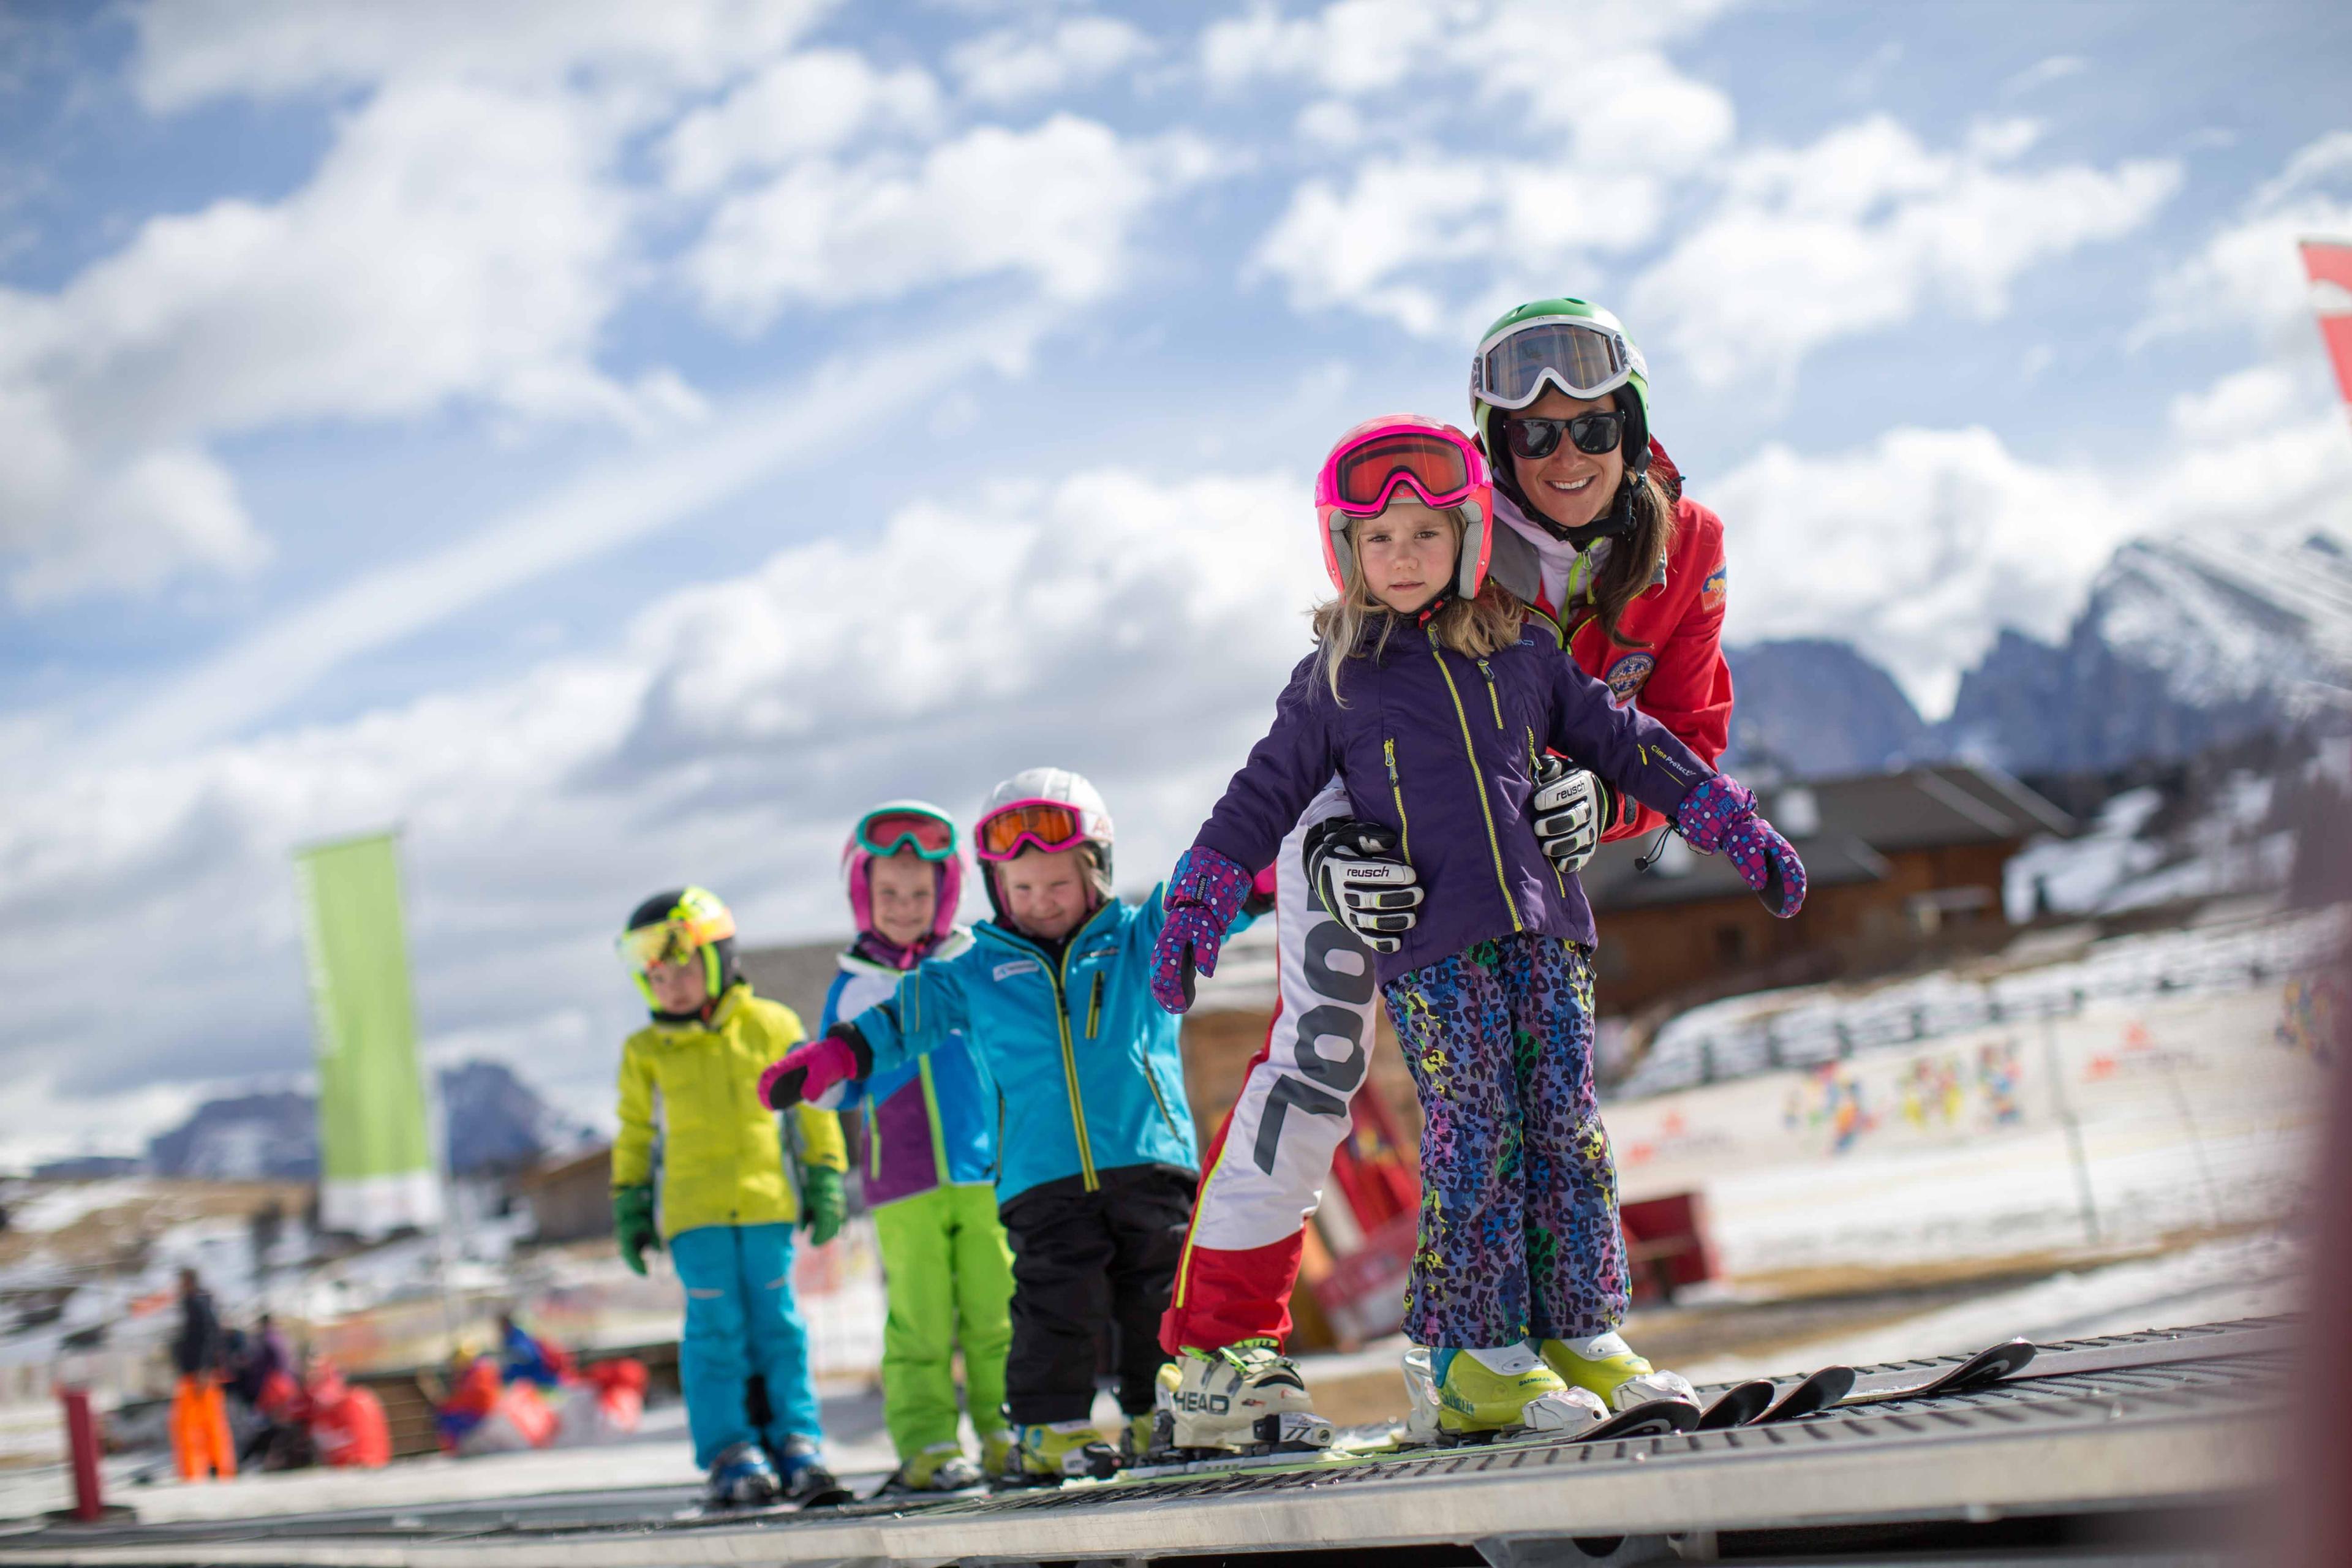 Ski Lessons for Kids (5-7 years) - Intermediate